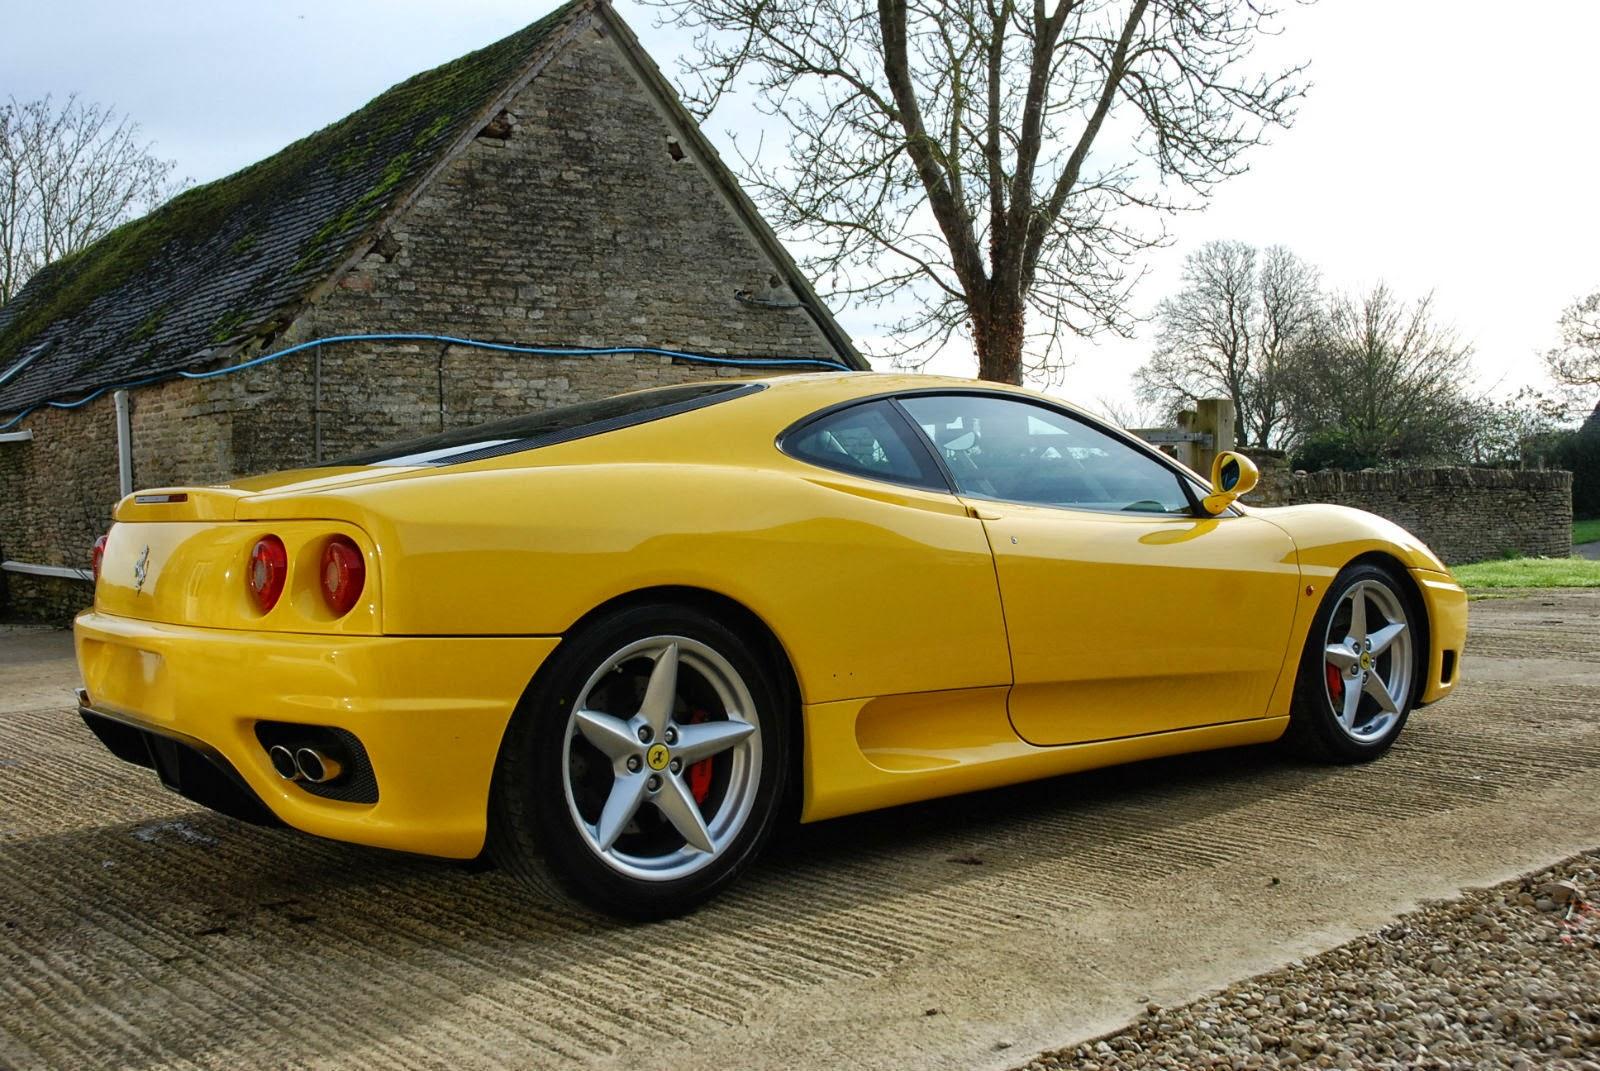 Yellow Ferrari 360 Modena 2001 Auto Restorationice